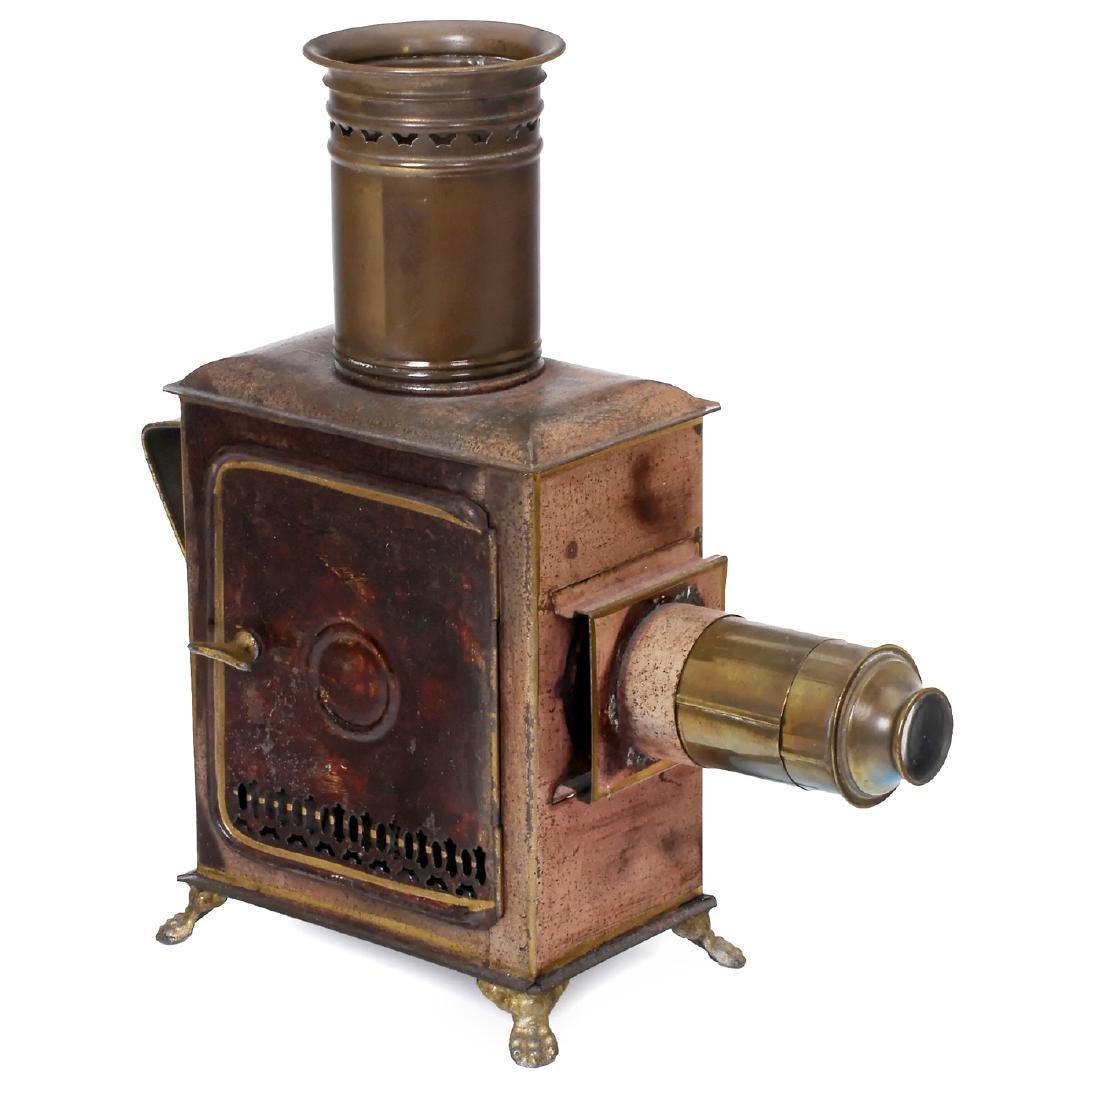 Rare Magic Lantern by Max Dannhorn, c. 1895